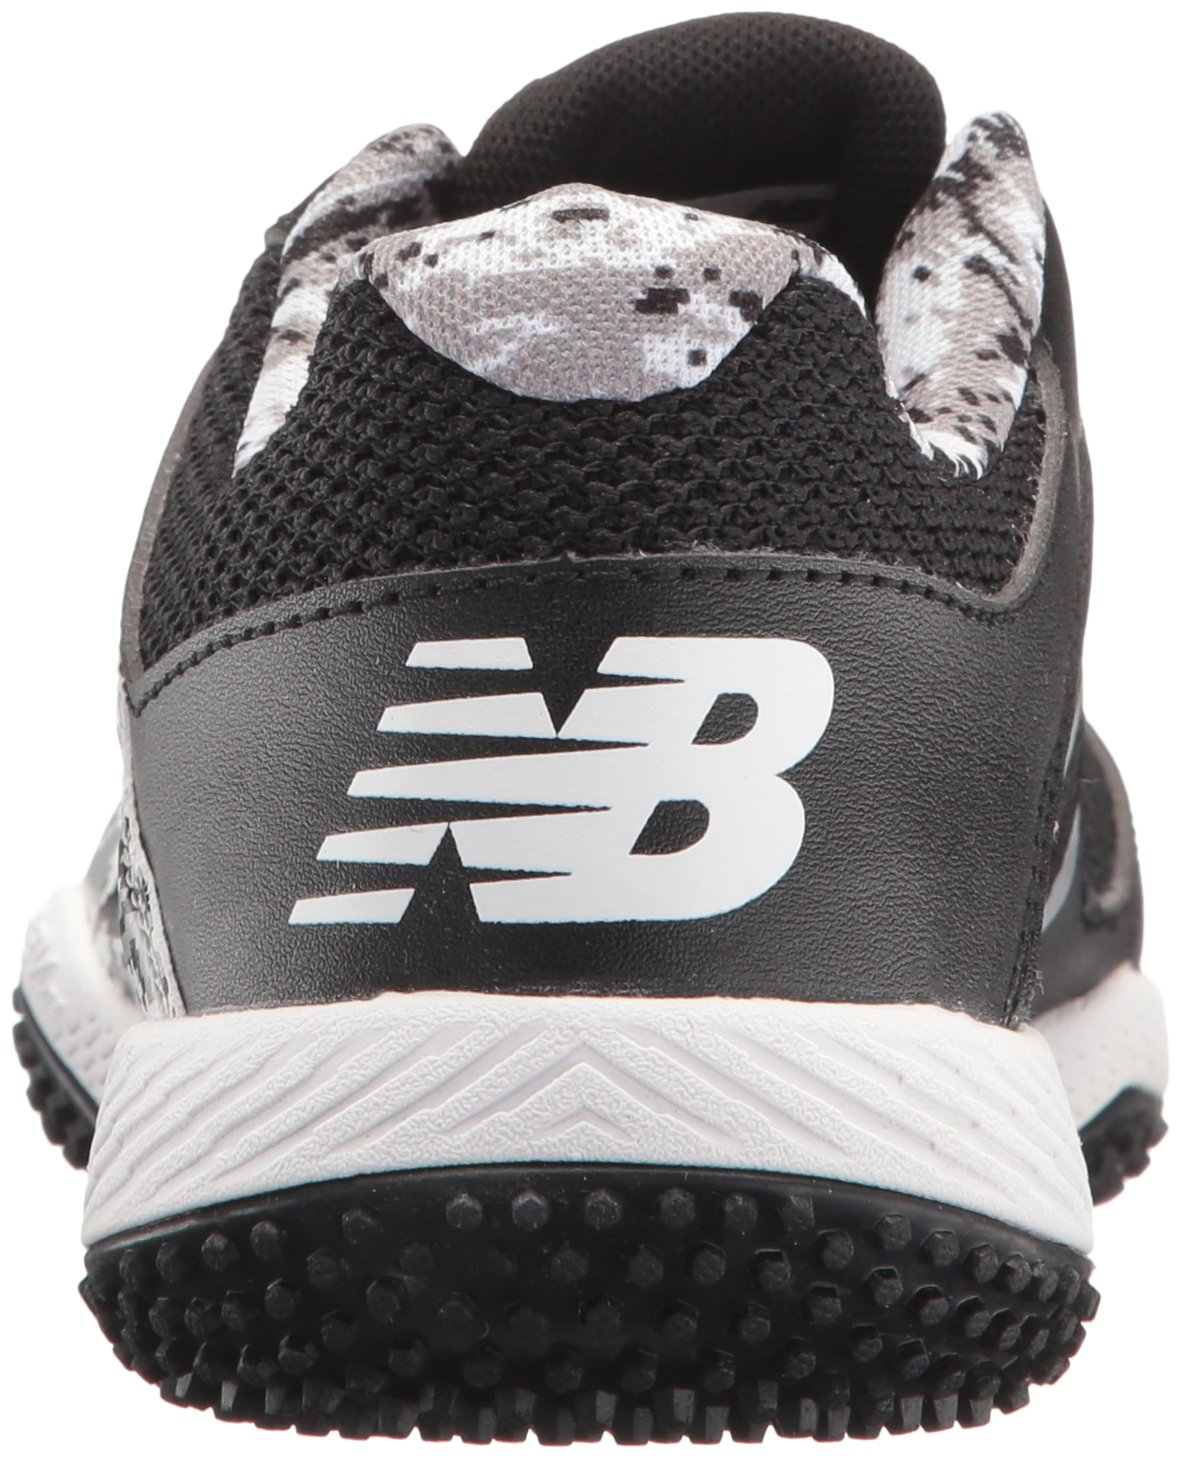 New Balance Boys' TY4040 Turf Baseball Shoe, Black/White, 6 M US Big Kid by New Balance (Image #2)